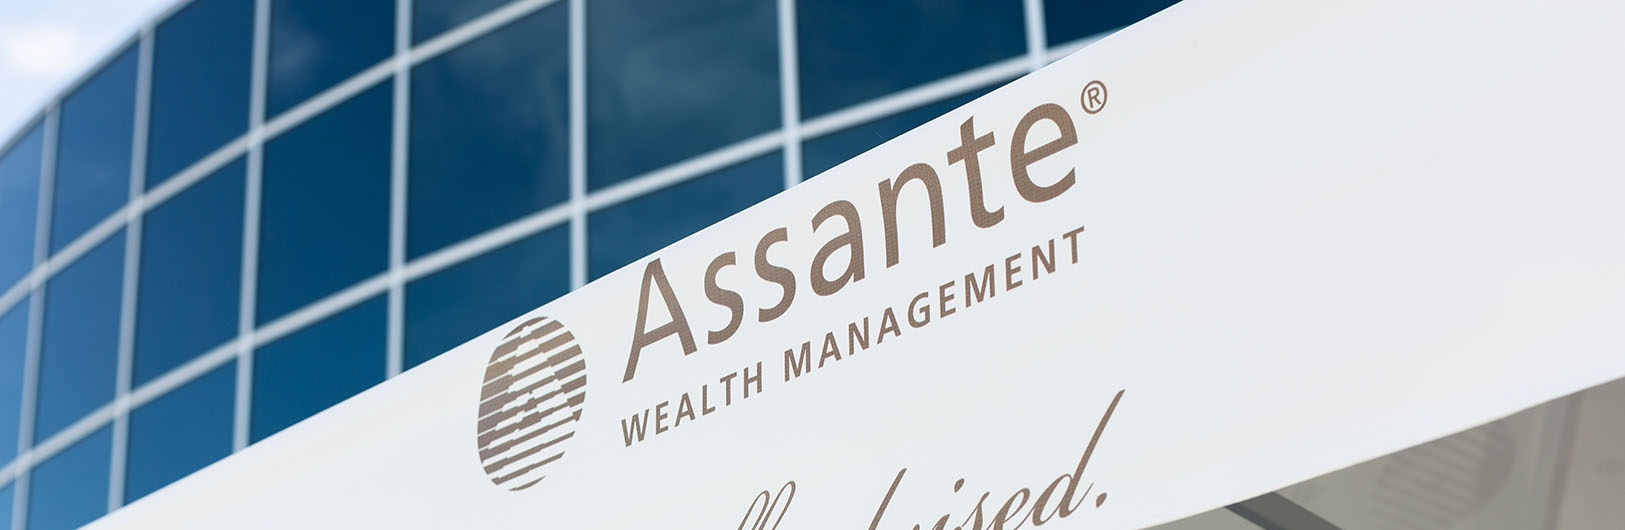 assante-wealth-management-header.jpg